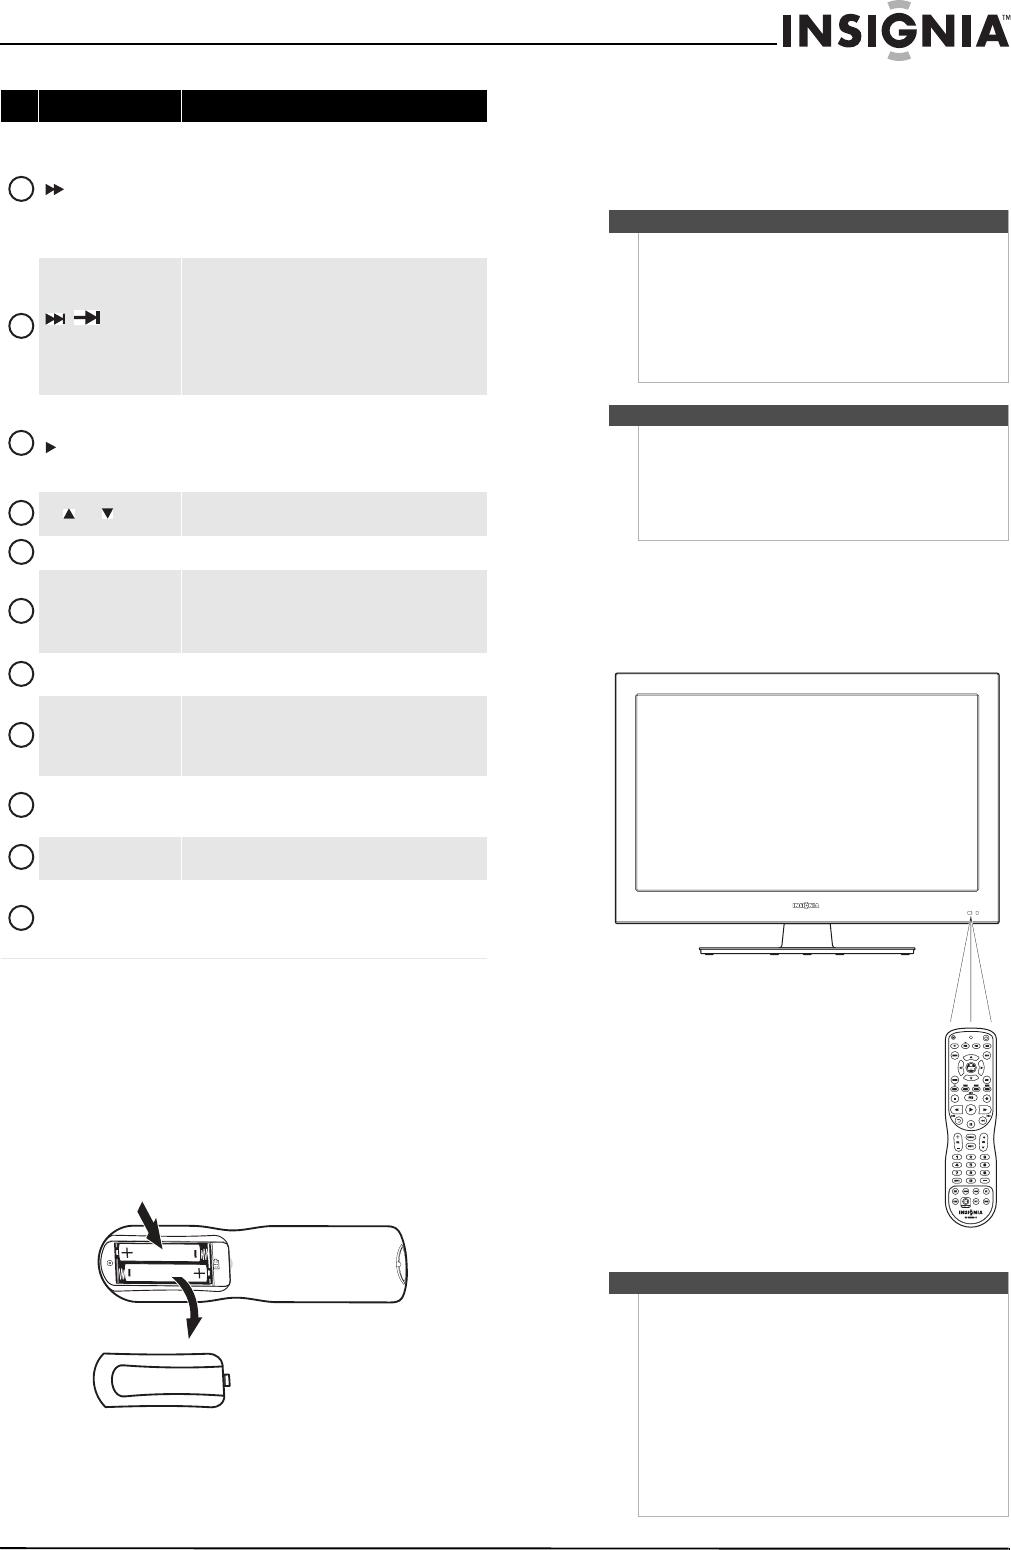 Insignia Ns 26L450A11 Users Manual